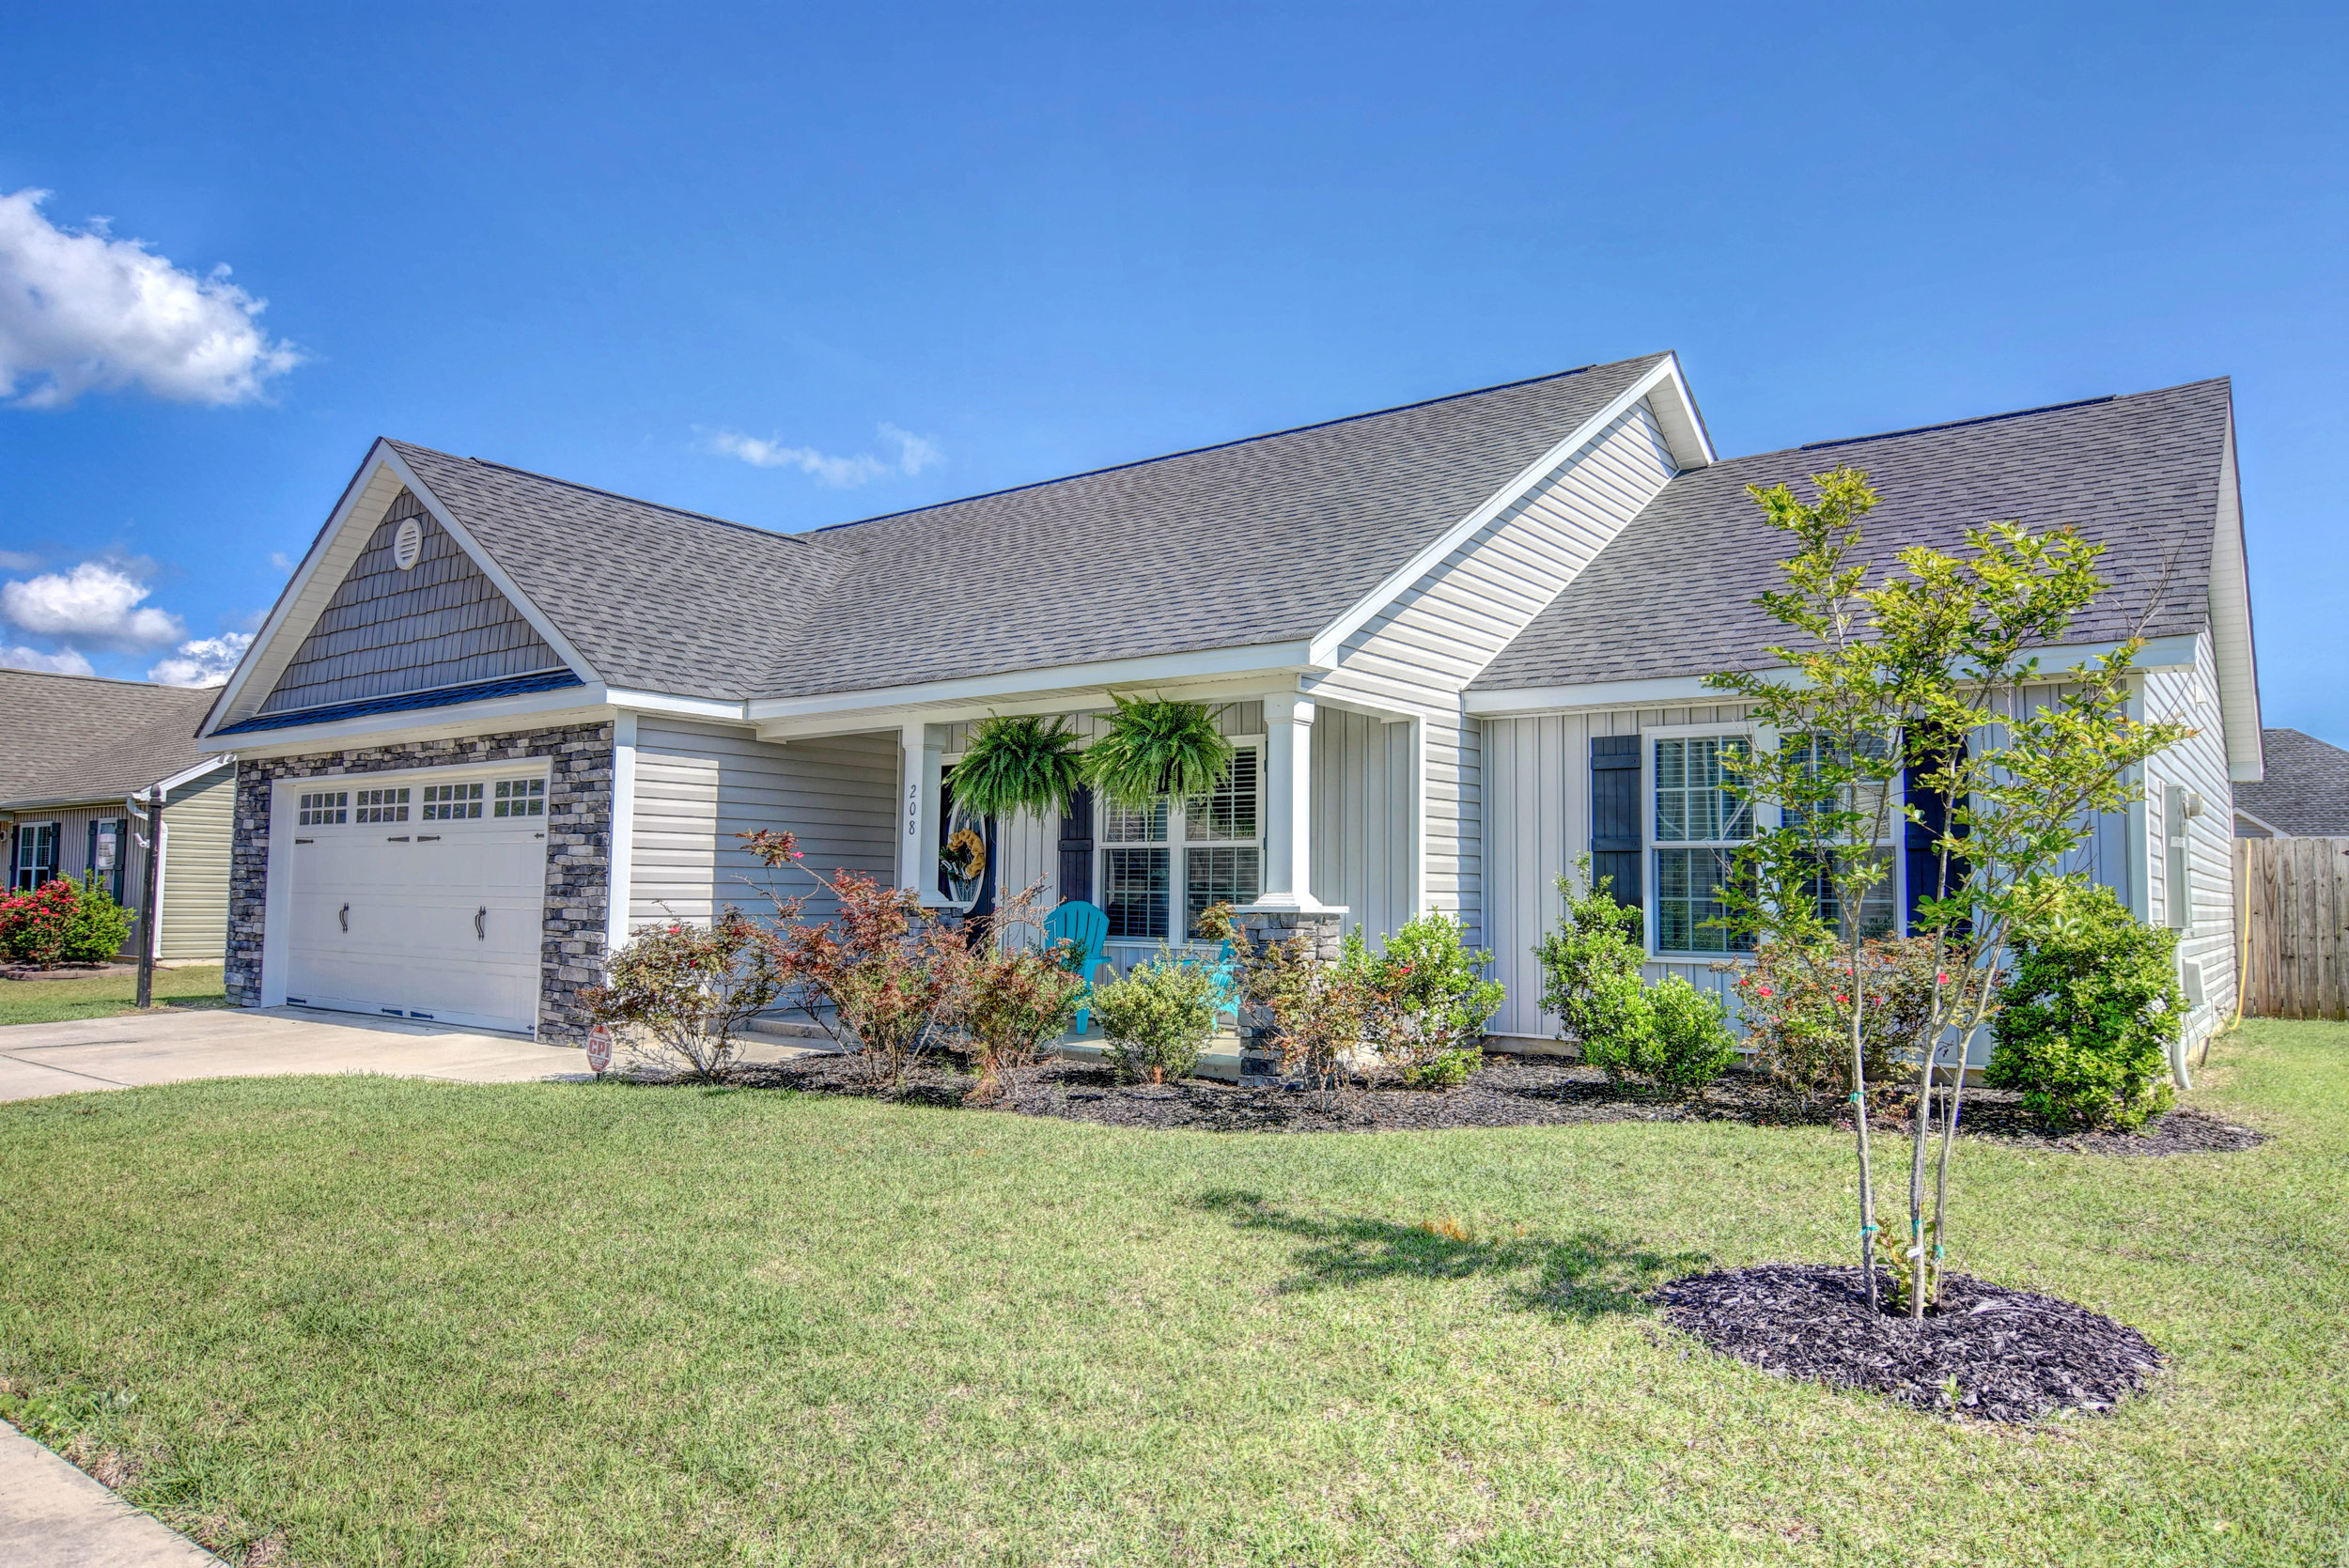 208 Riverstone Ct Jacksonville-print-001-7-DSC 7652 3 4-4200x2804-300dpi.jpg